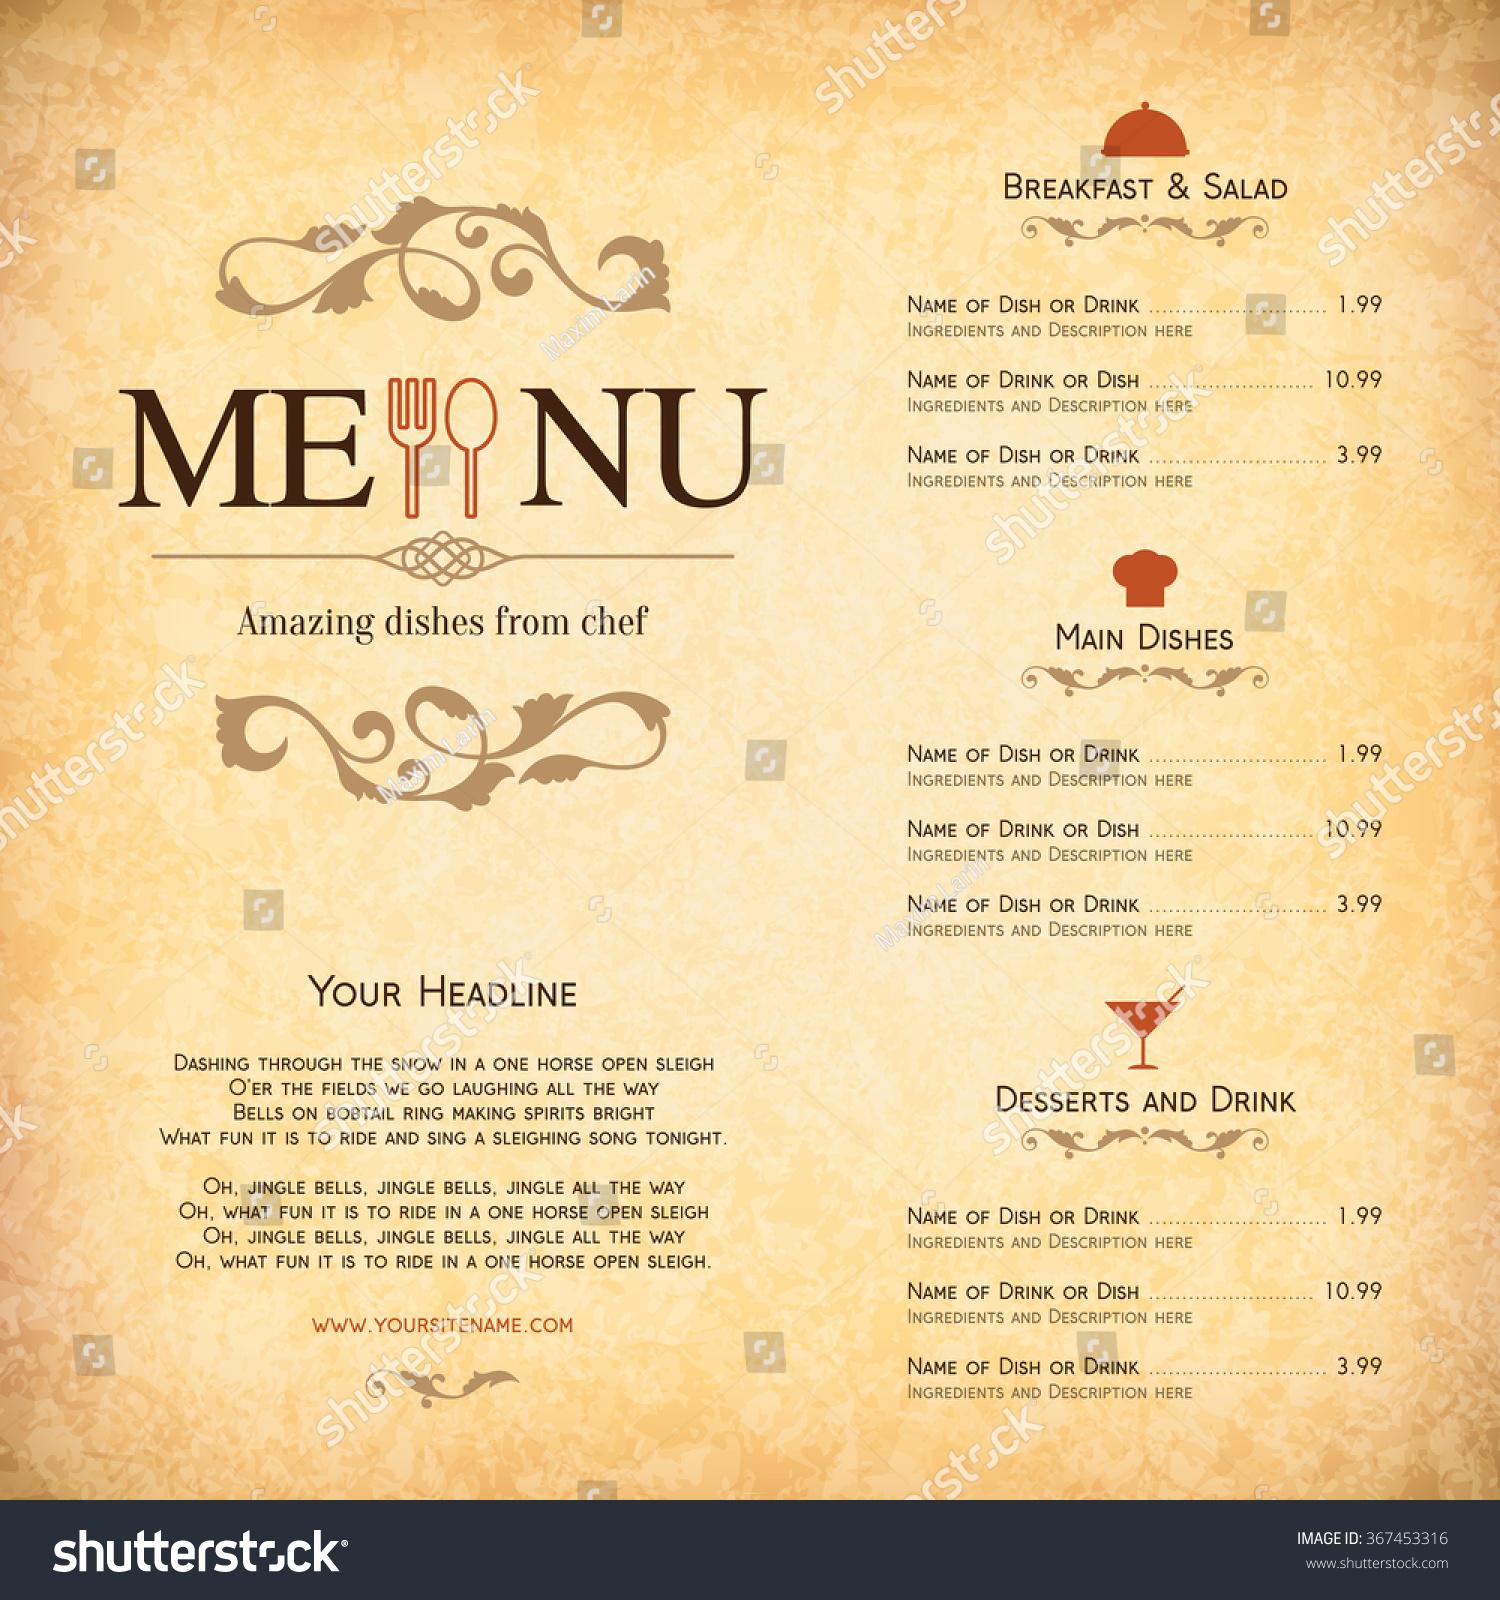 Vector Brochure Template For Cafe, Coffee House, Restaurant, Bar